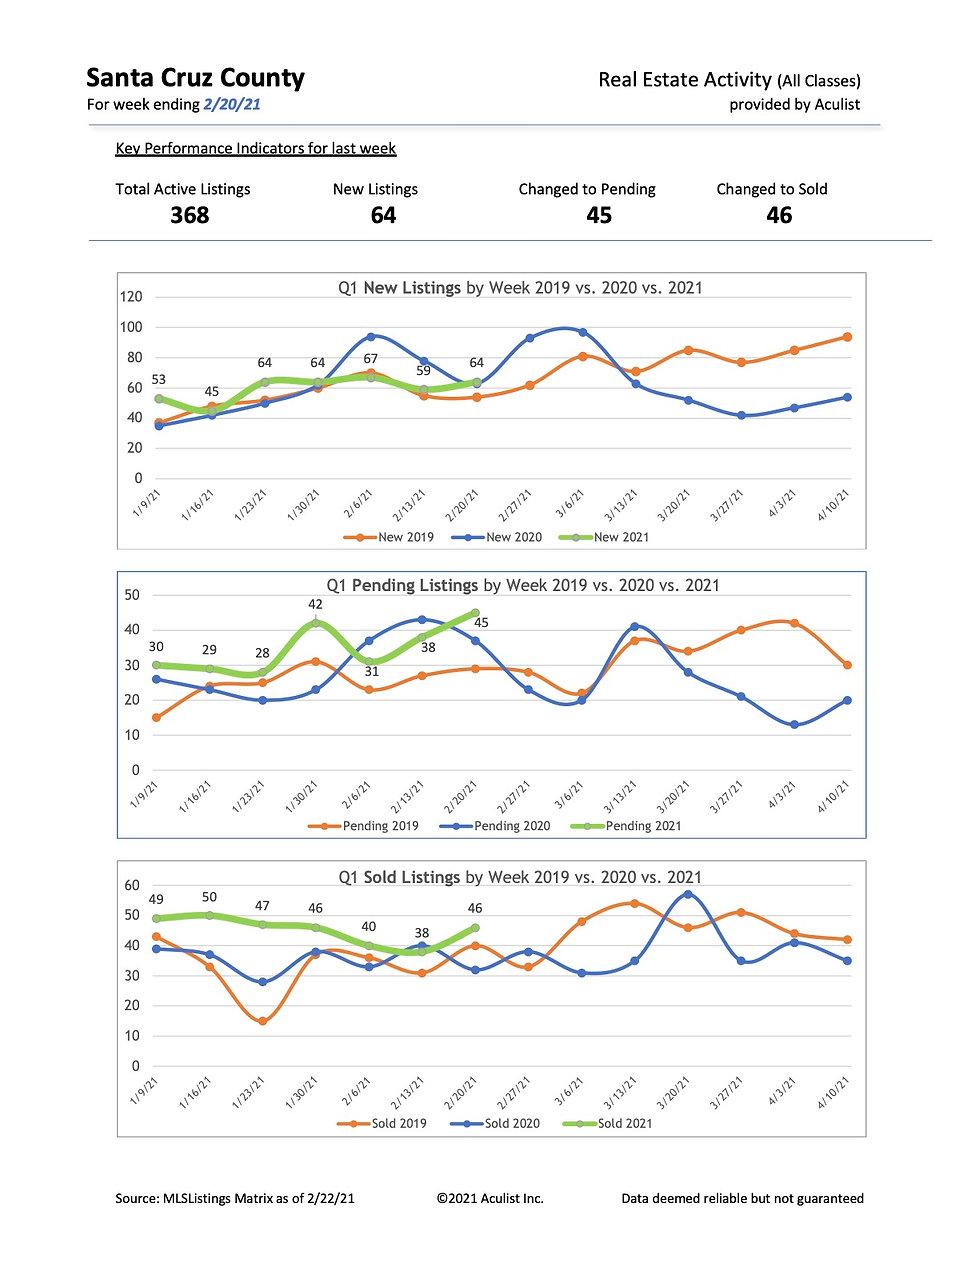 SZC-WeeklyStats-2.20.21.jpg